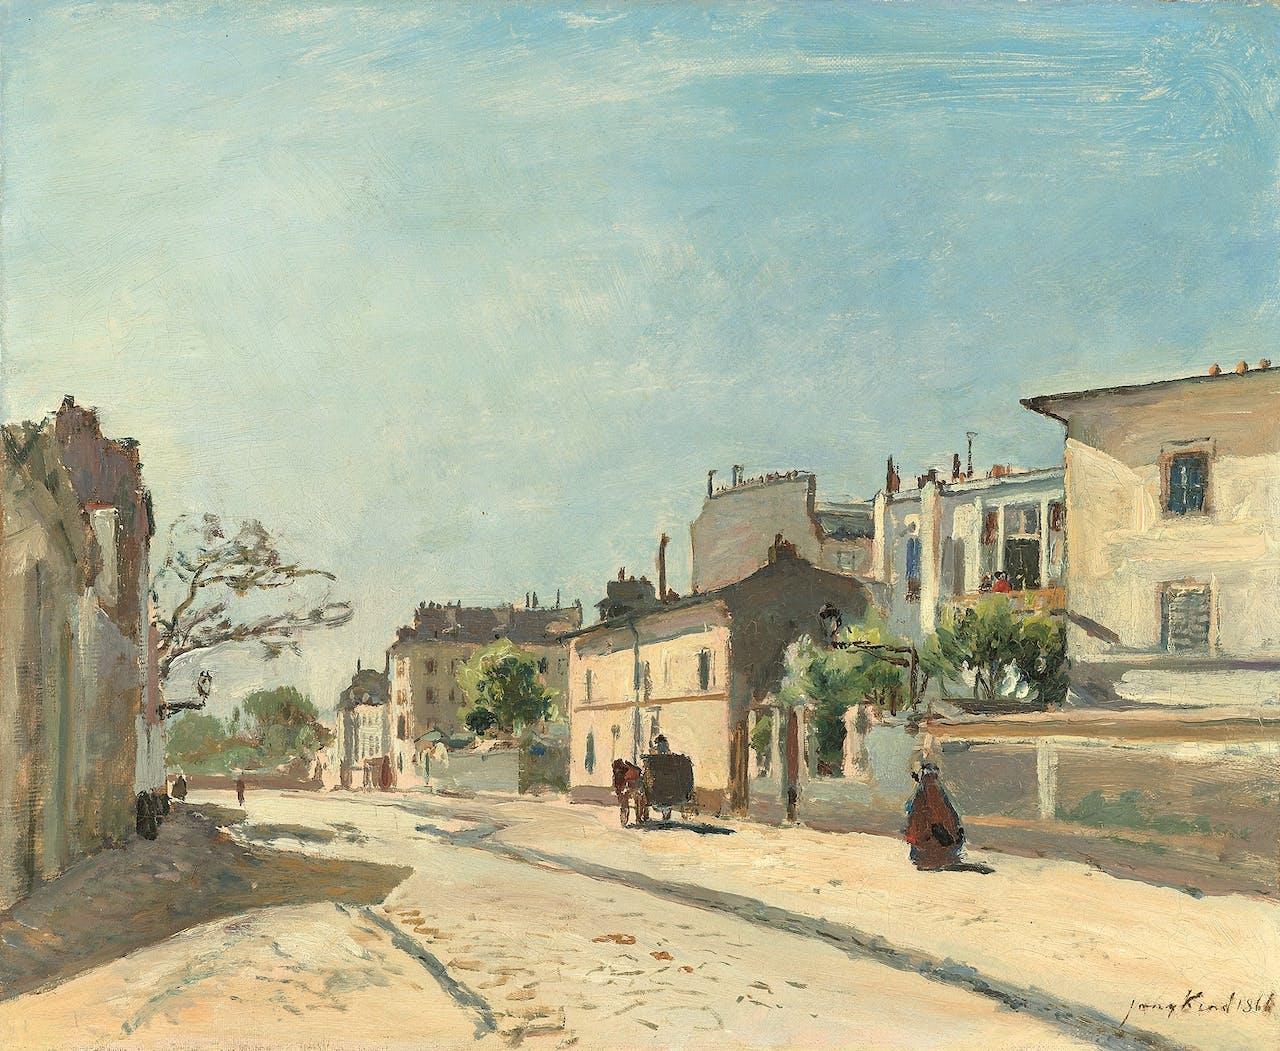 'Rue Nôtre-Dame, Parijs', Johan Barthold Jongkind, 1866.